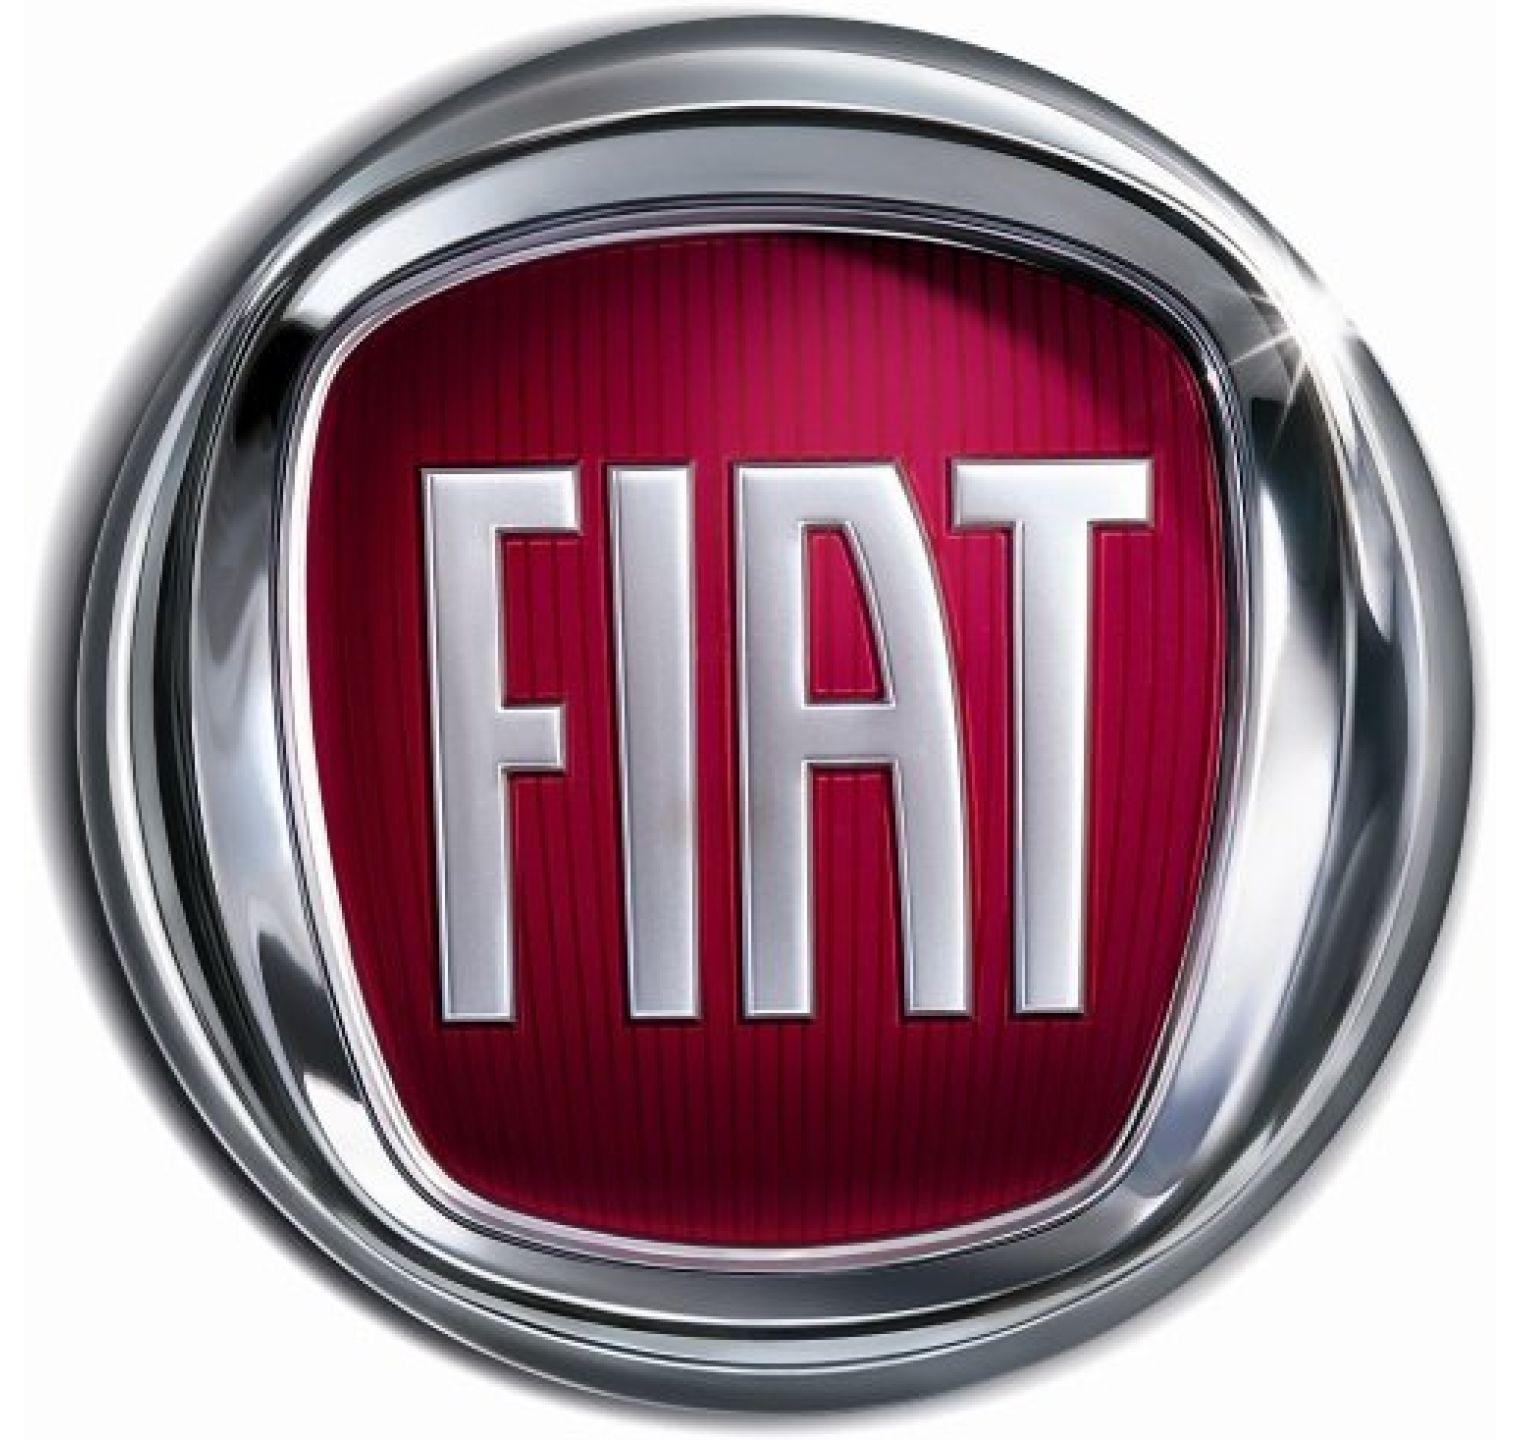 Fiat Ducato Open Laadbak/ Chassis (vanaf 2002) - set ruitenwissers Valeo Hydroconnect